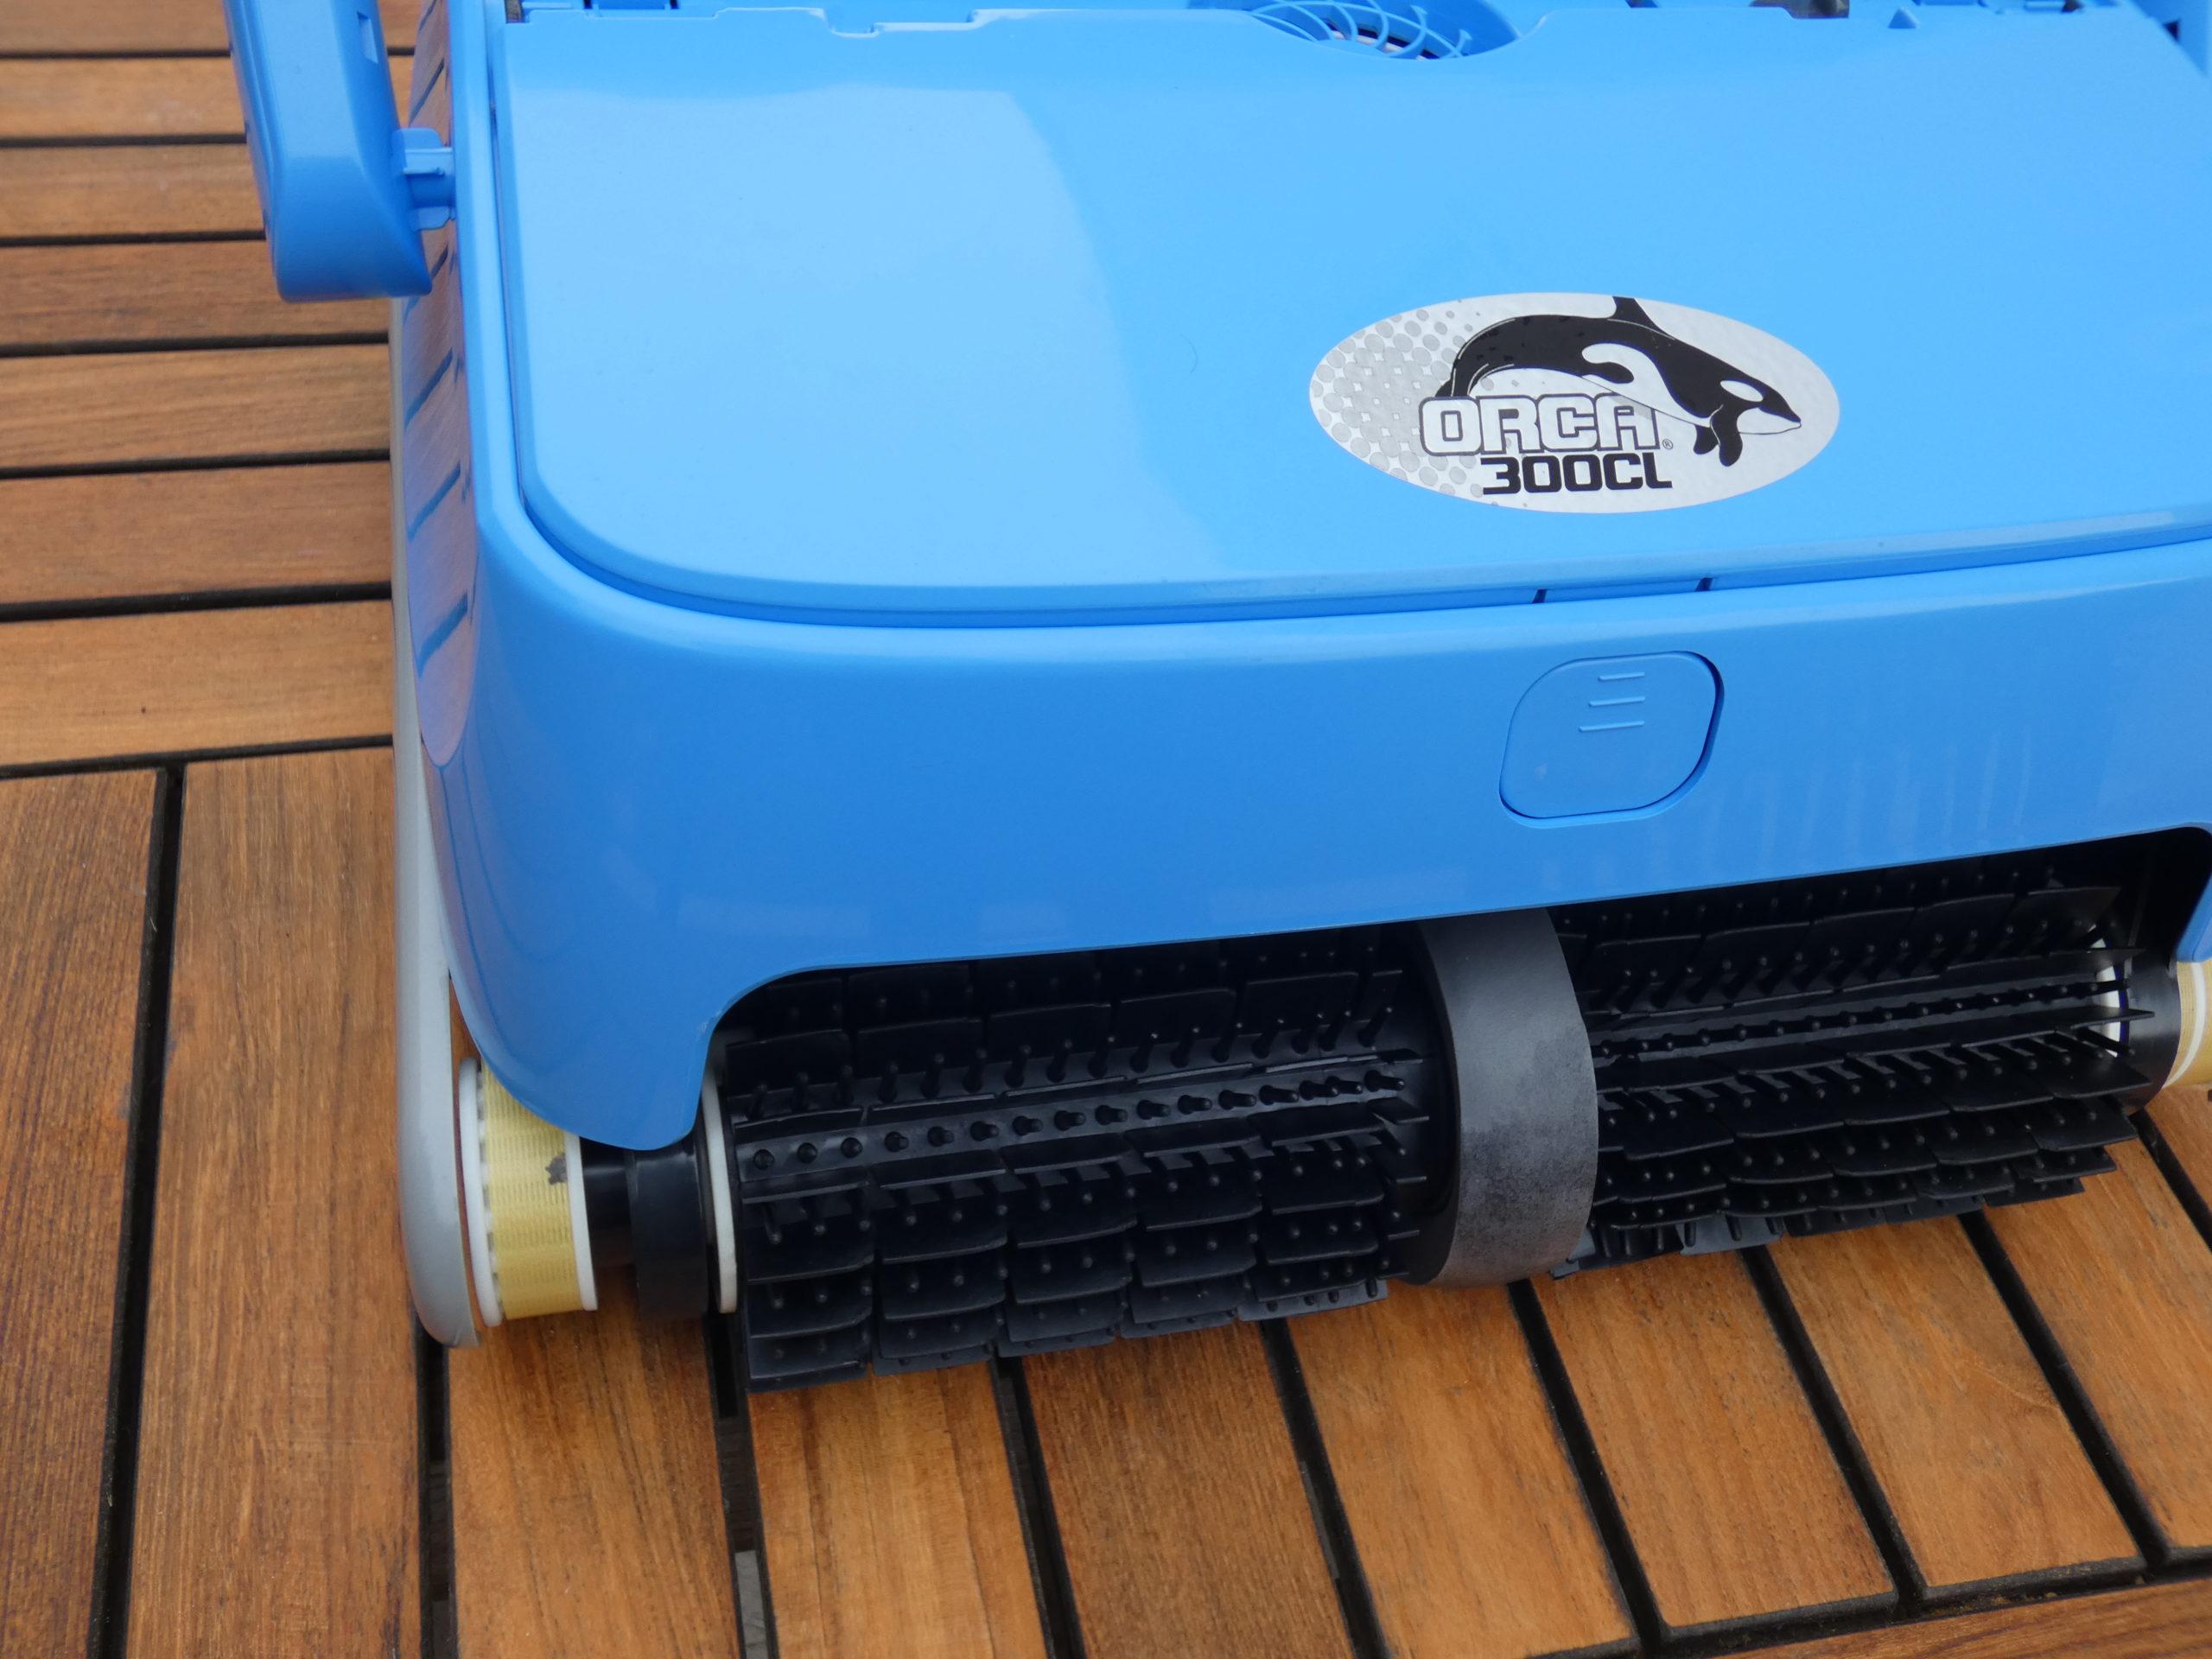 Orca 50 robot pour piscine hors sol, zodiac pool cleaner